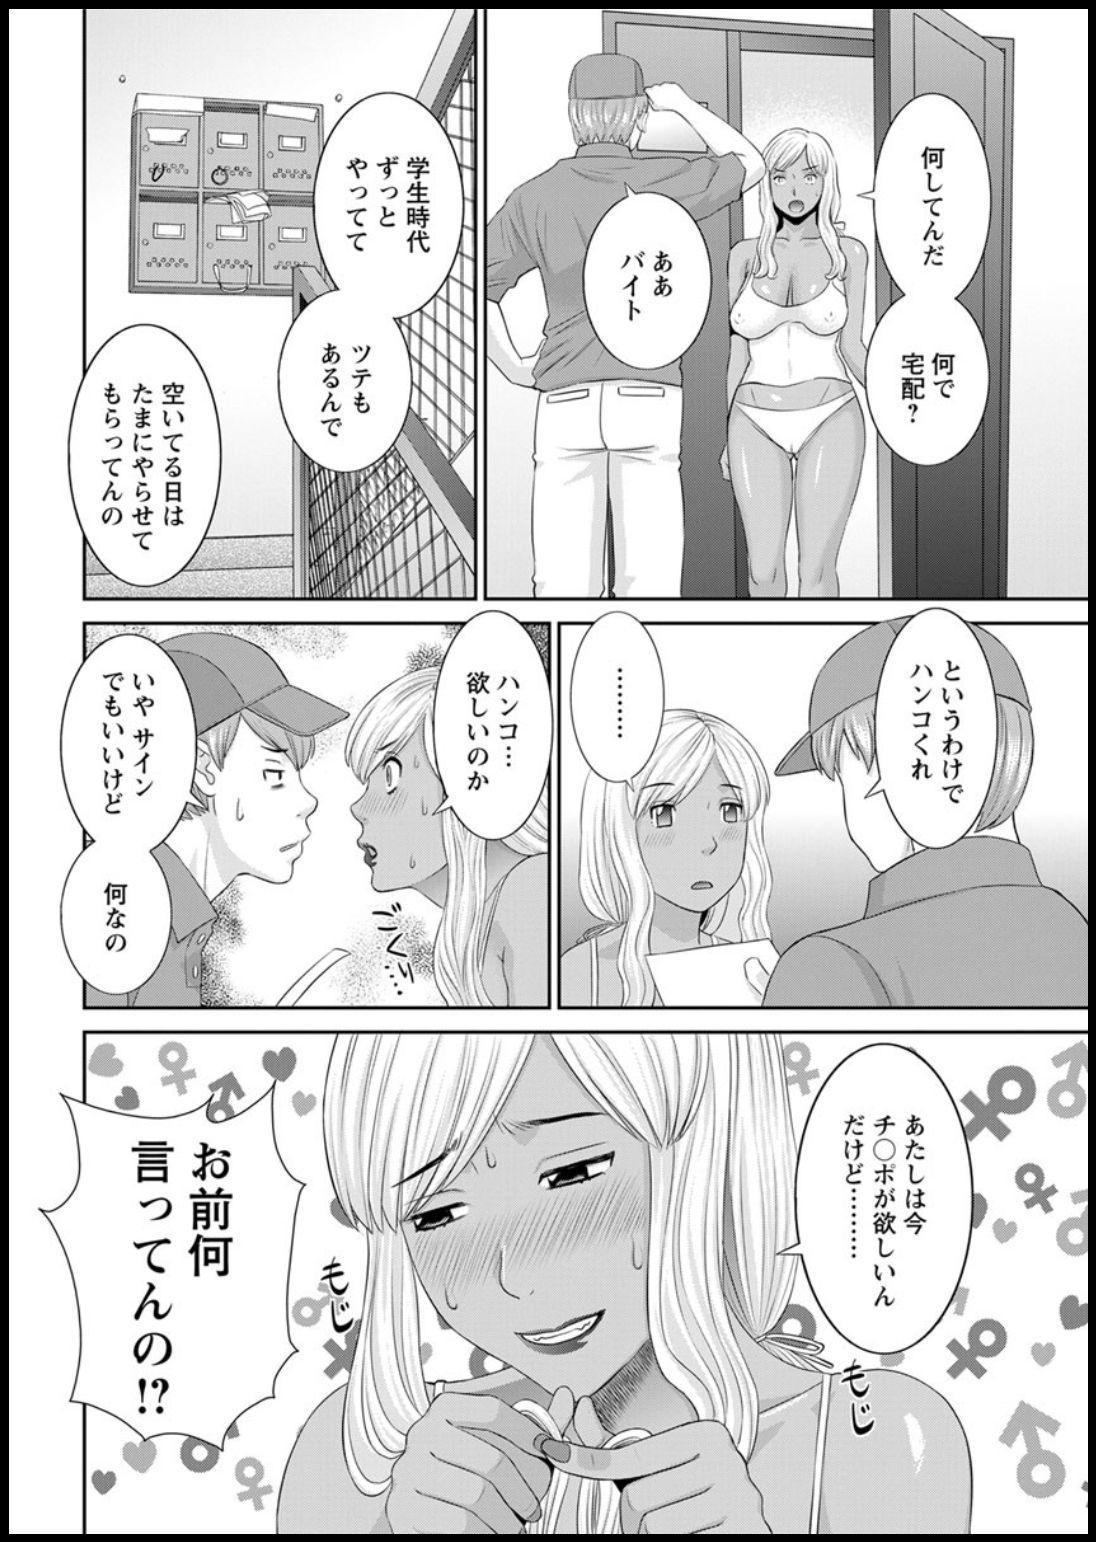 [Kawamori Misaki] Kaikan Hitotsuma Gakuen Ch. 1-6, 8-16 [Digital] 119